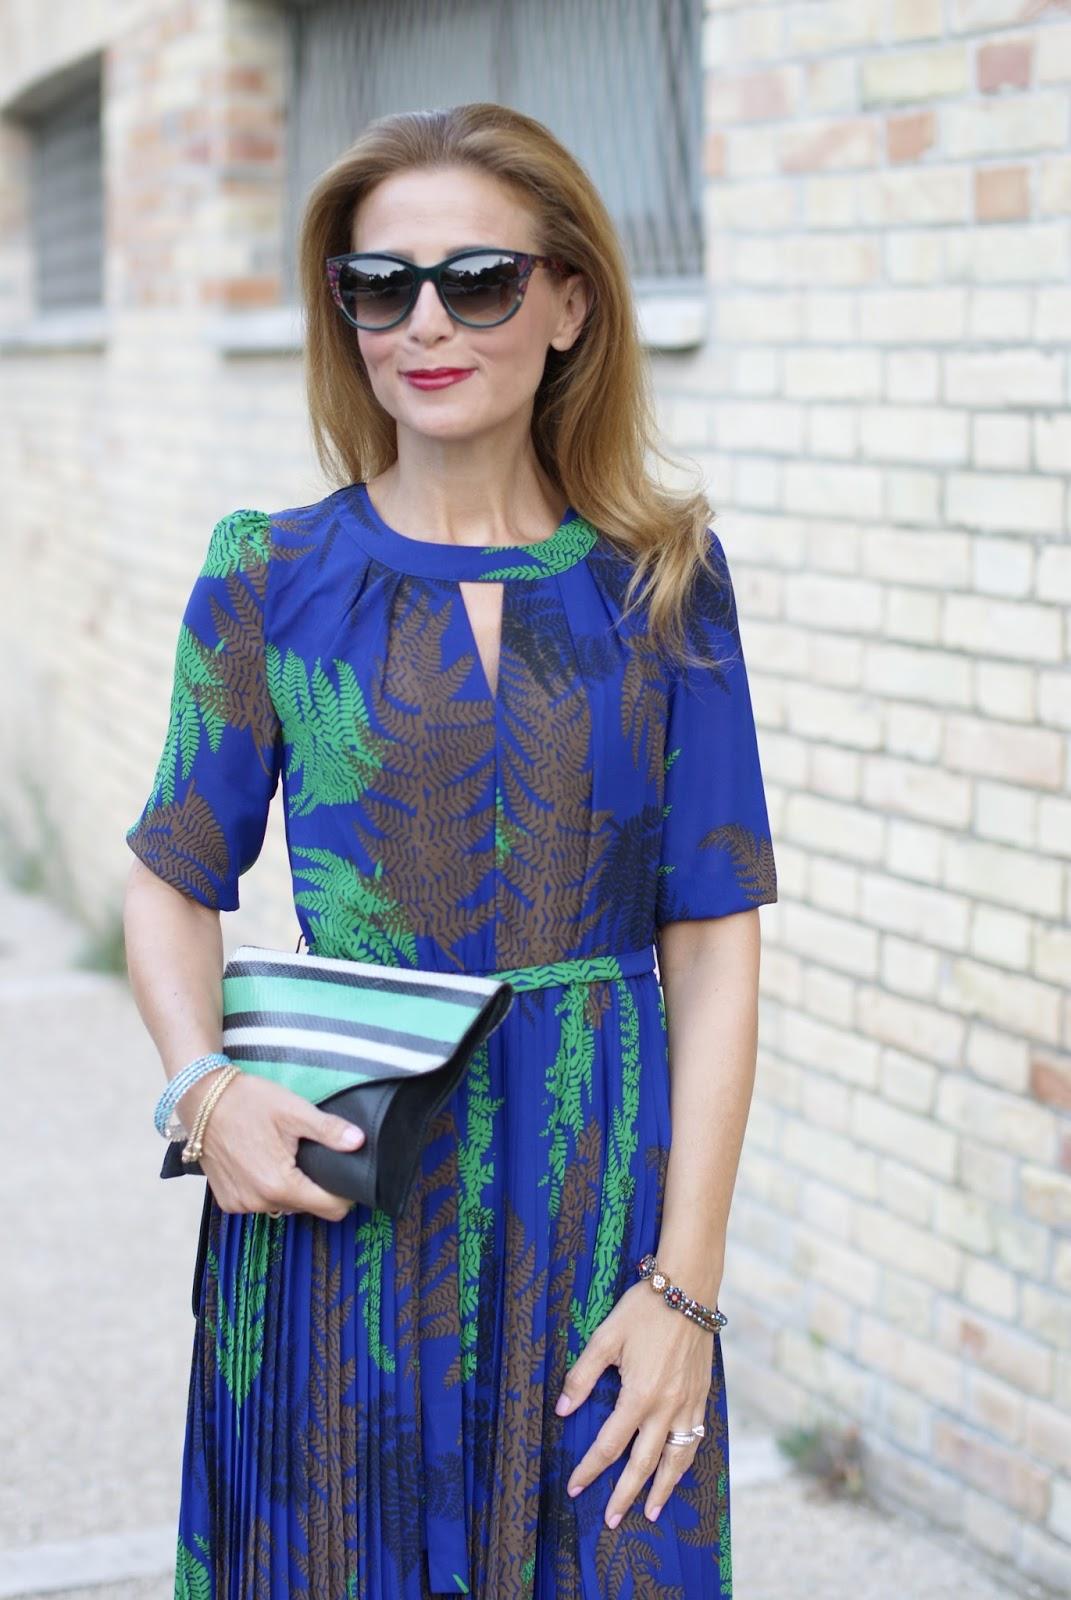 Bracciali blu girl summer long dress